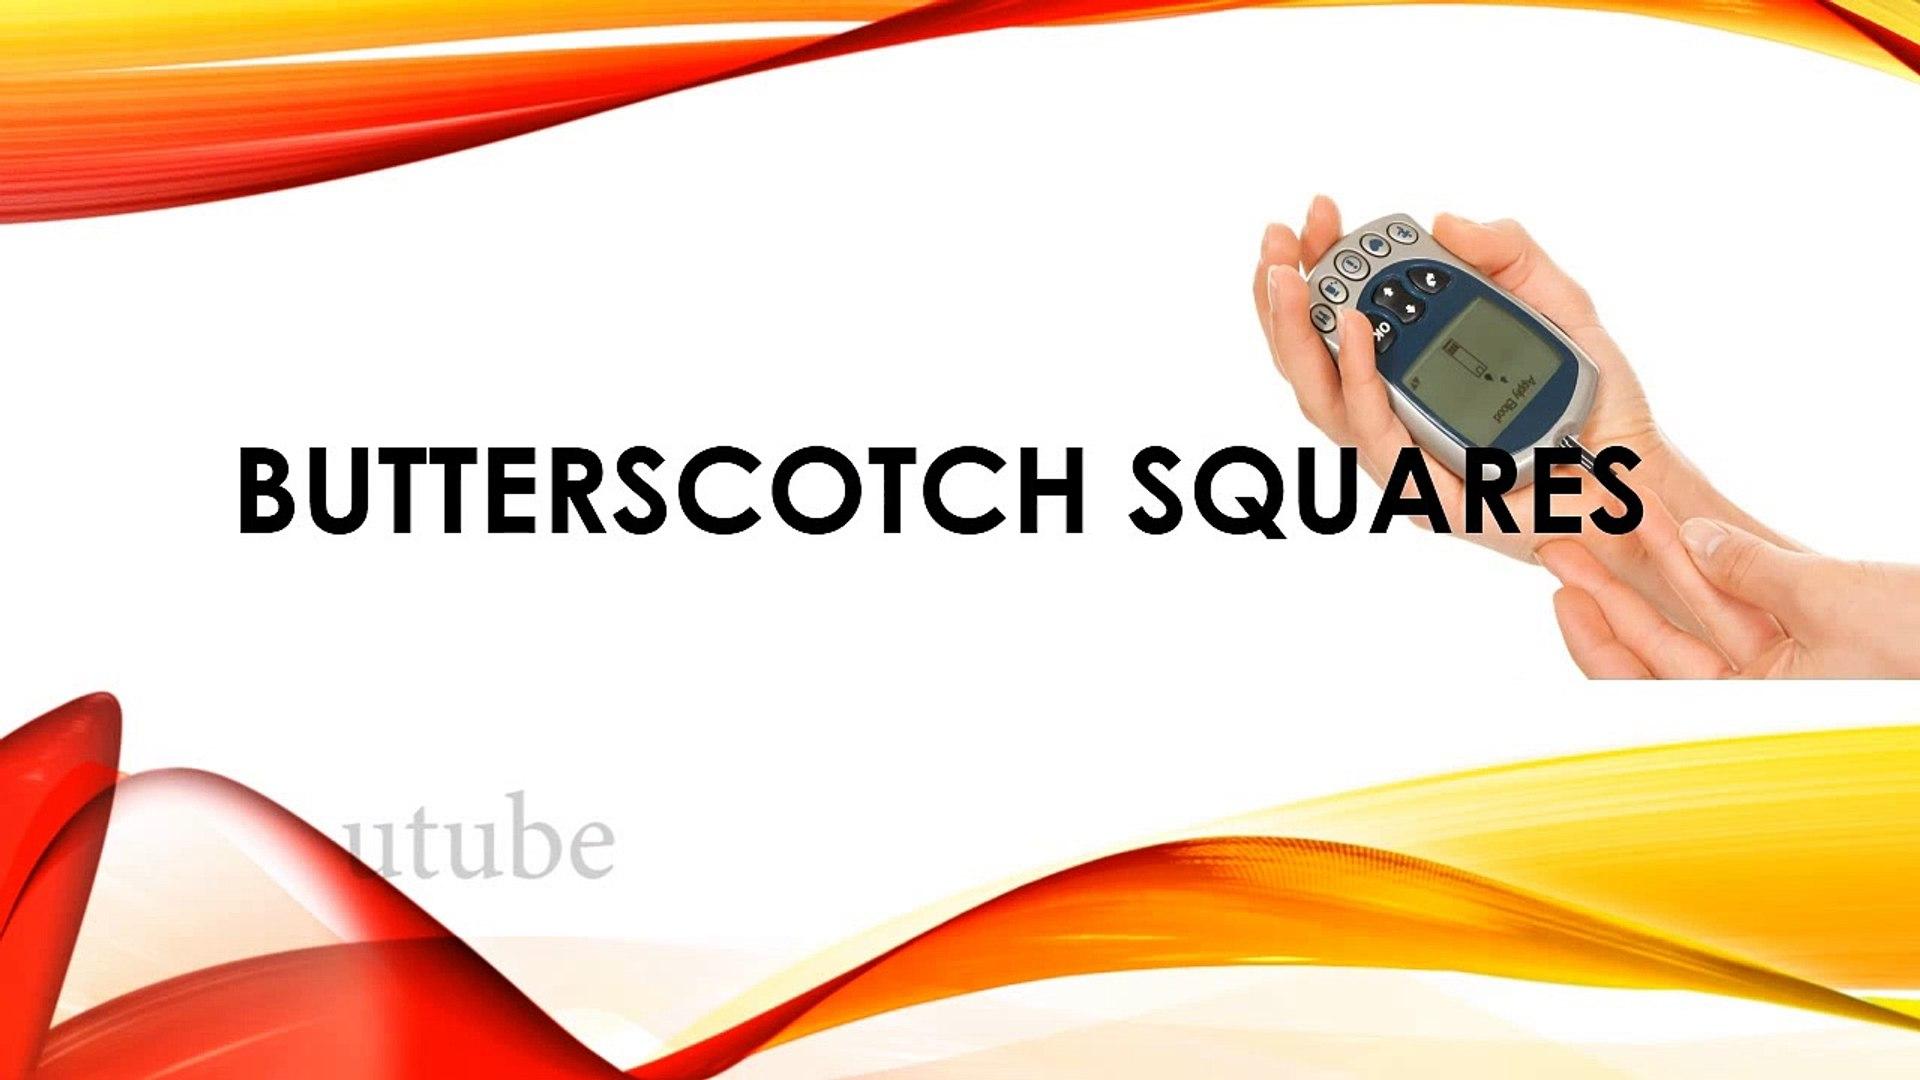 Butterscotch Squares - Butterscotch Recipes - Diabetic Recipes